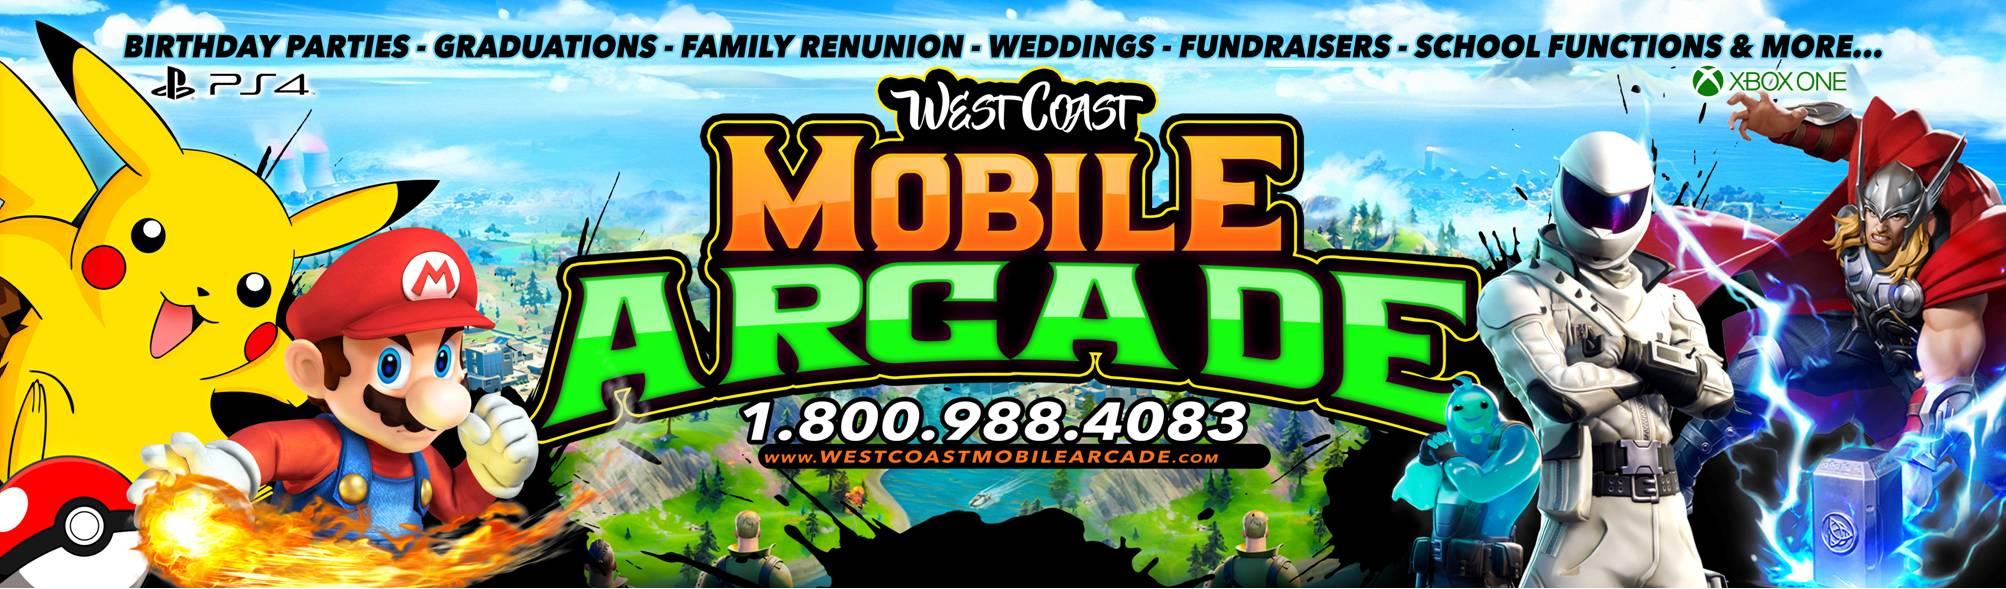 West Coast Mobile Arcade video game truck in San Bernardino County California